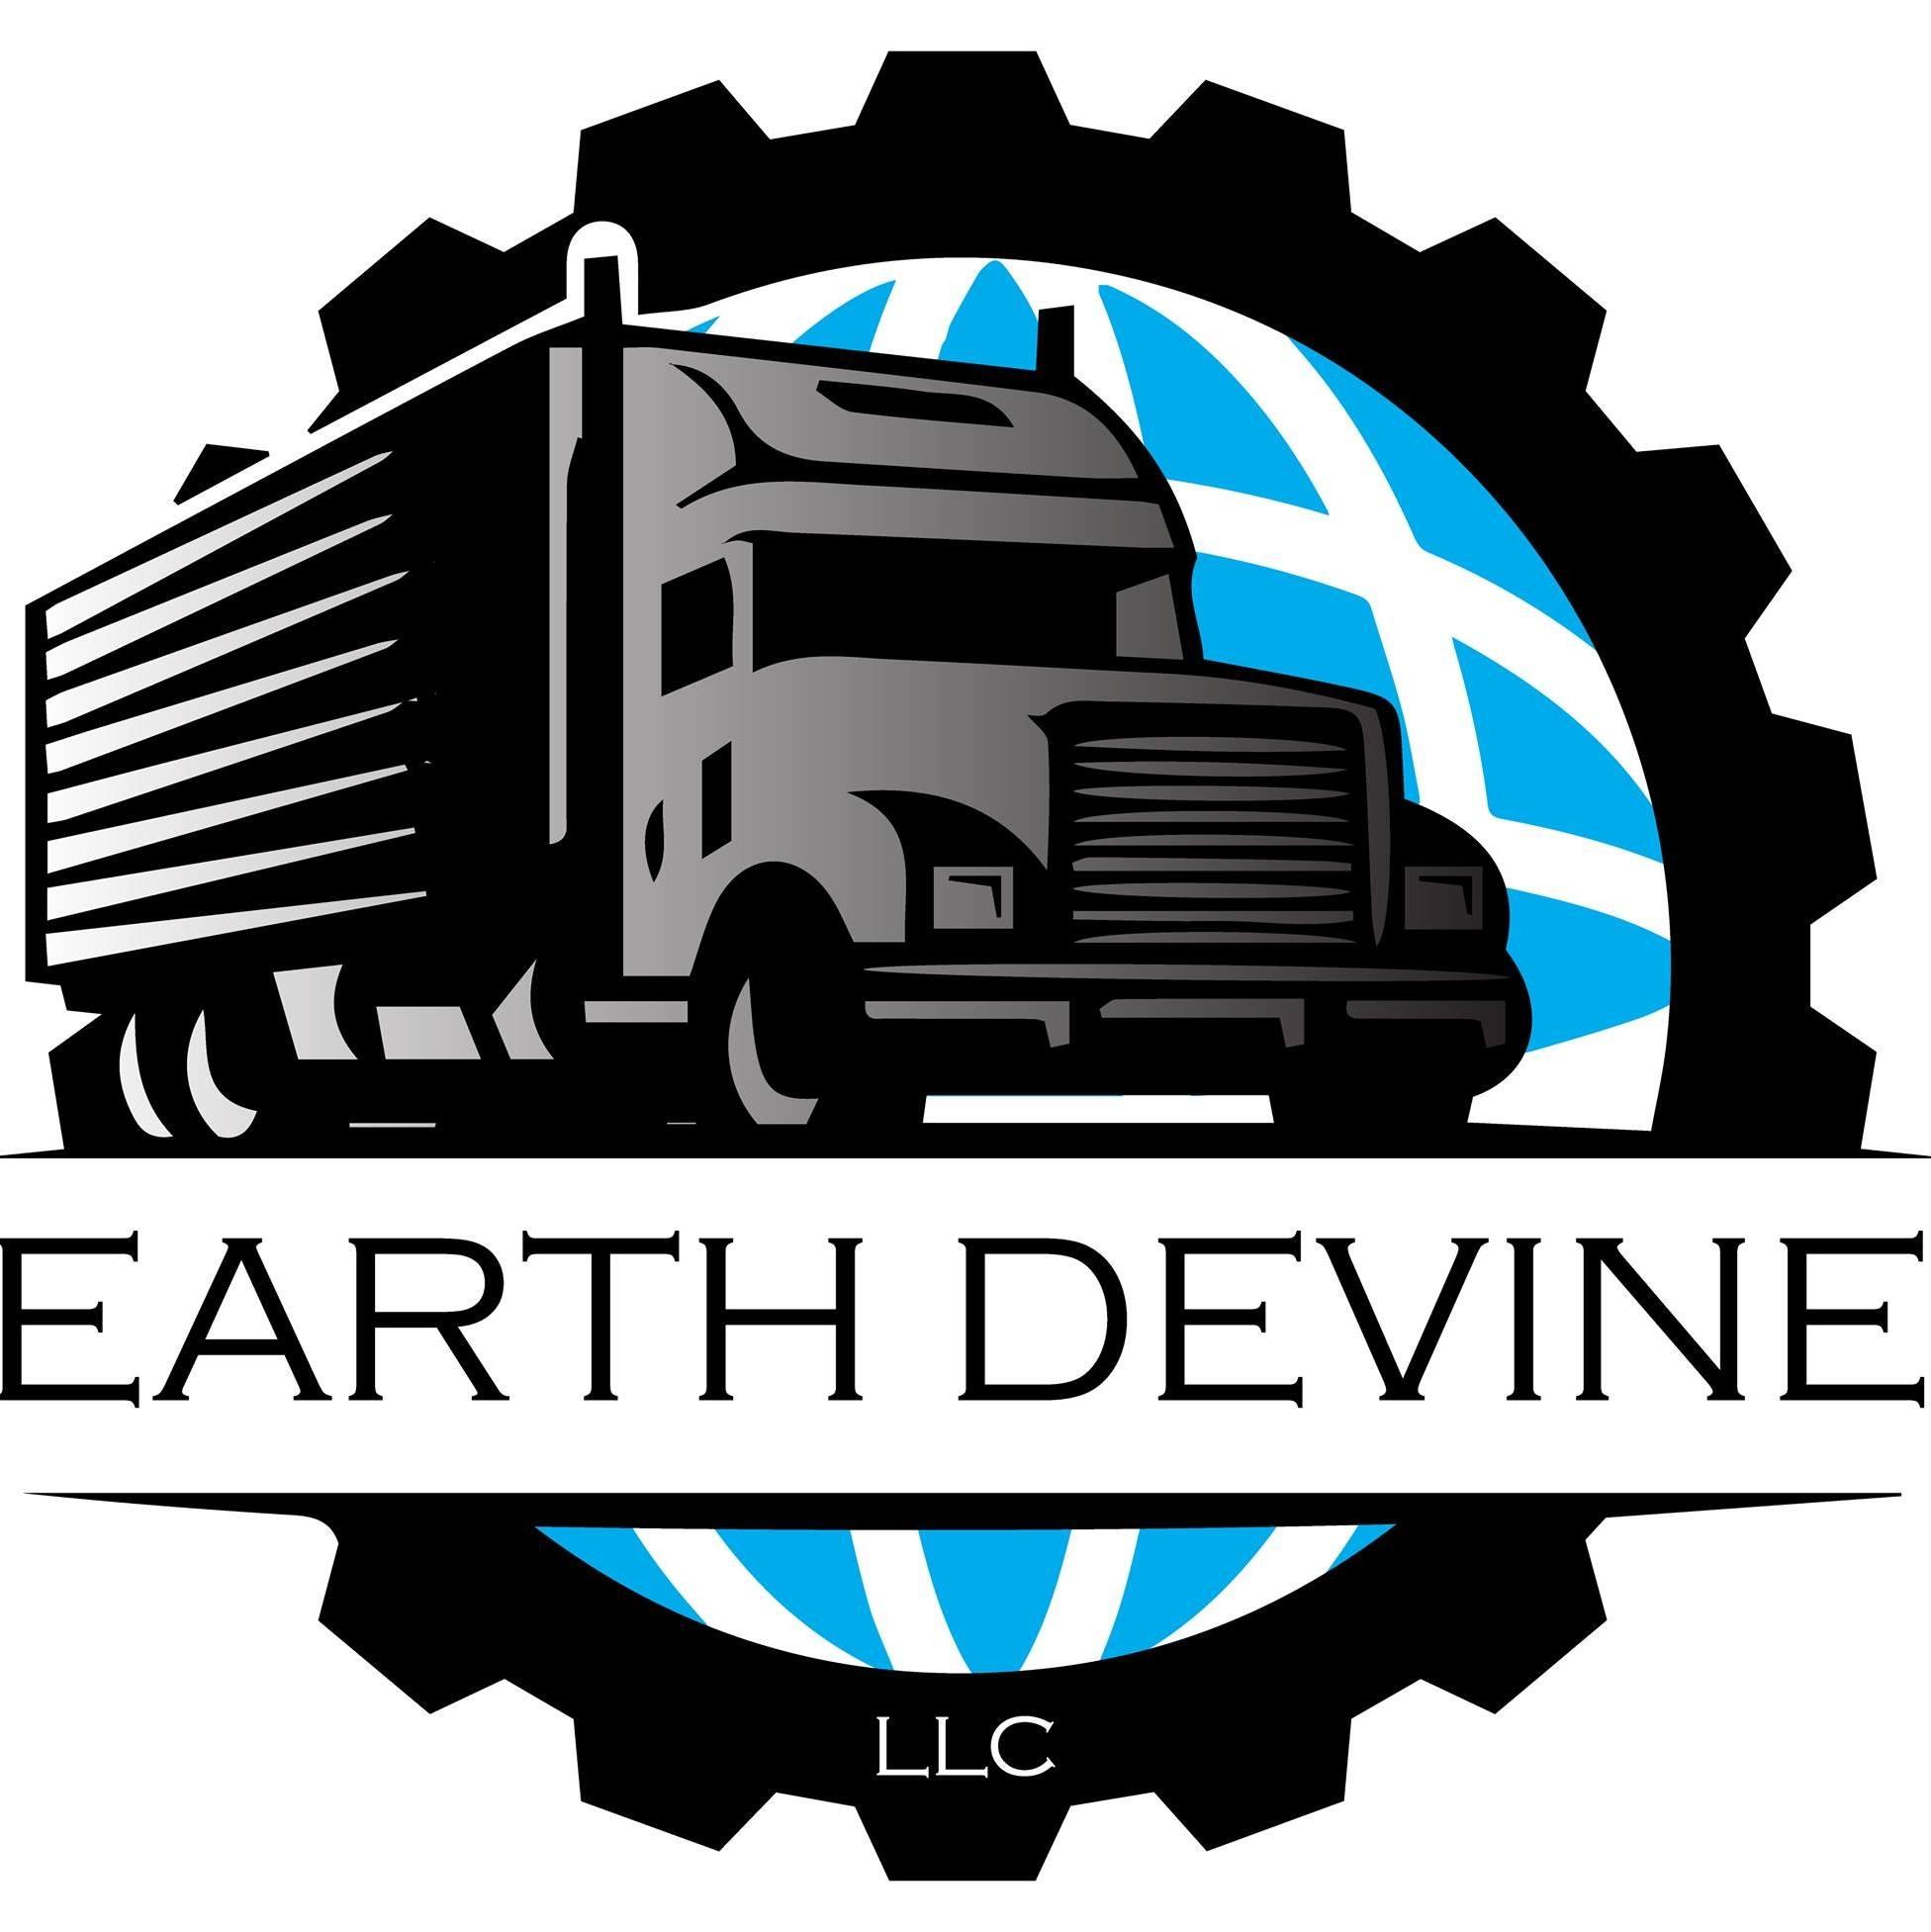 Earth Devine LLC